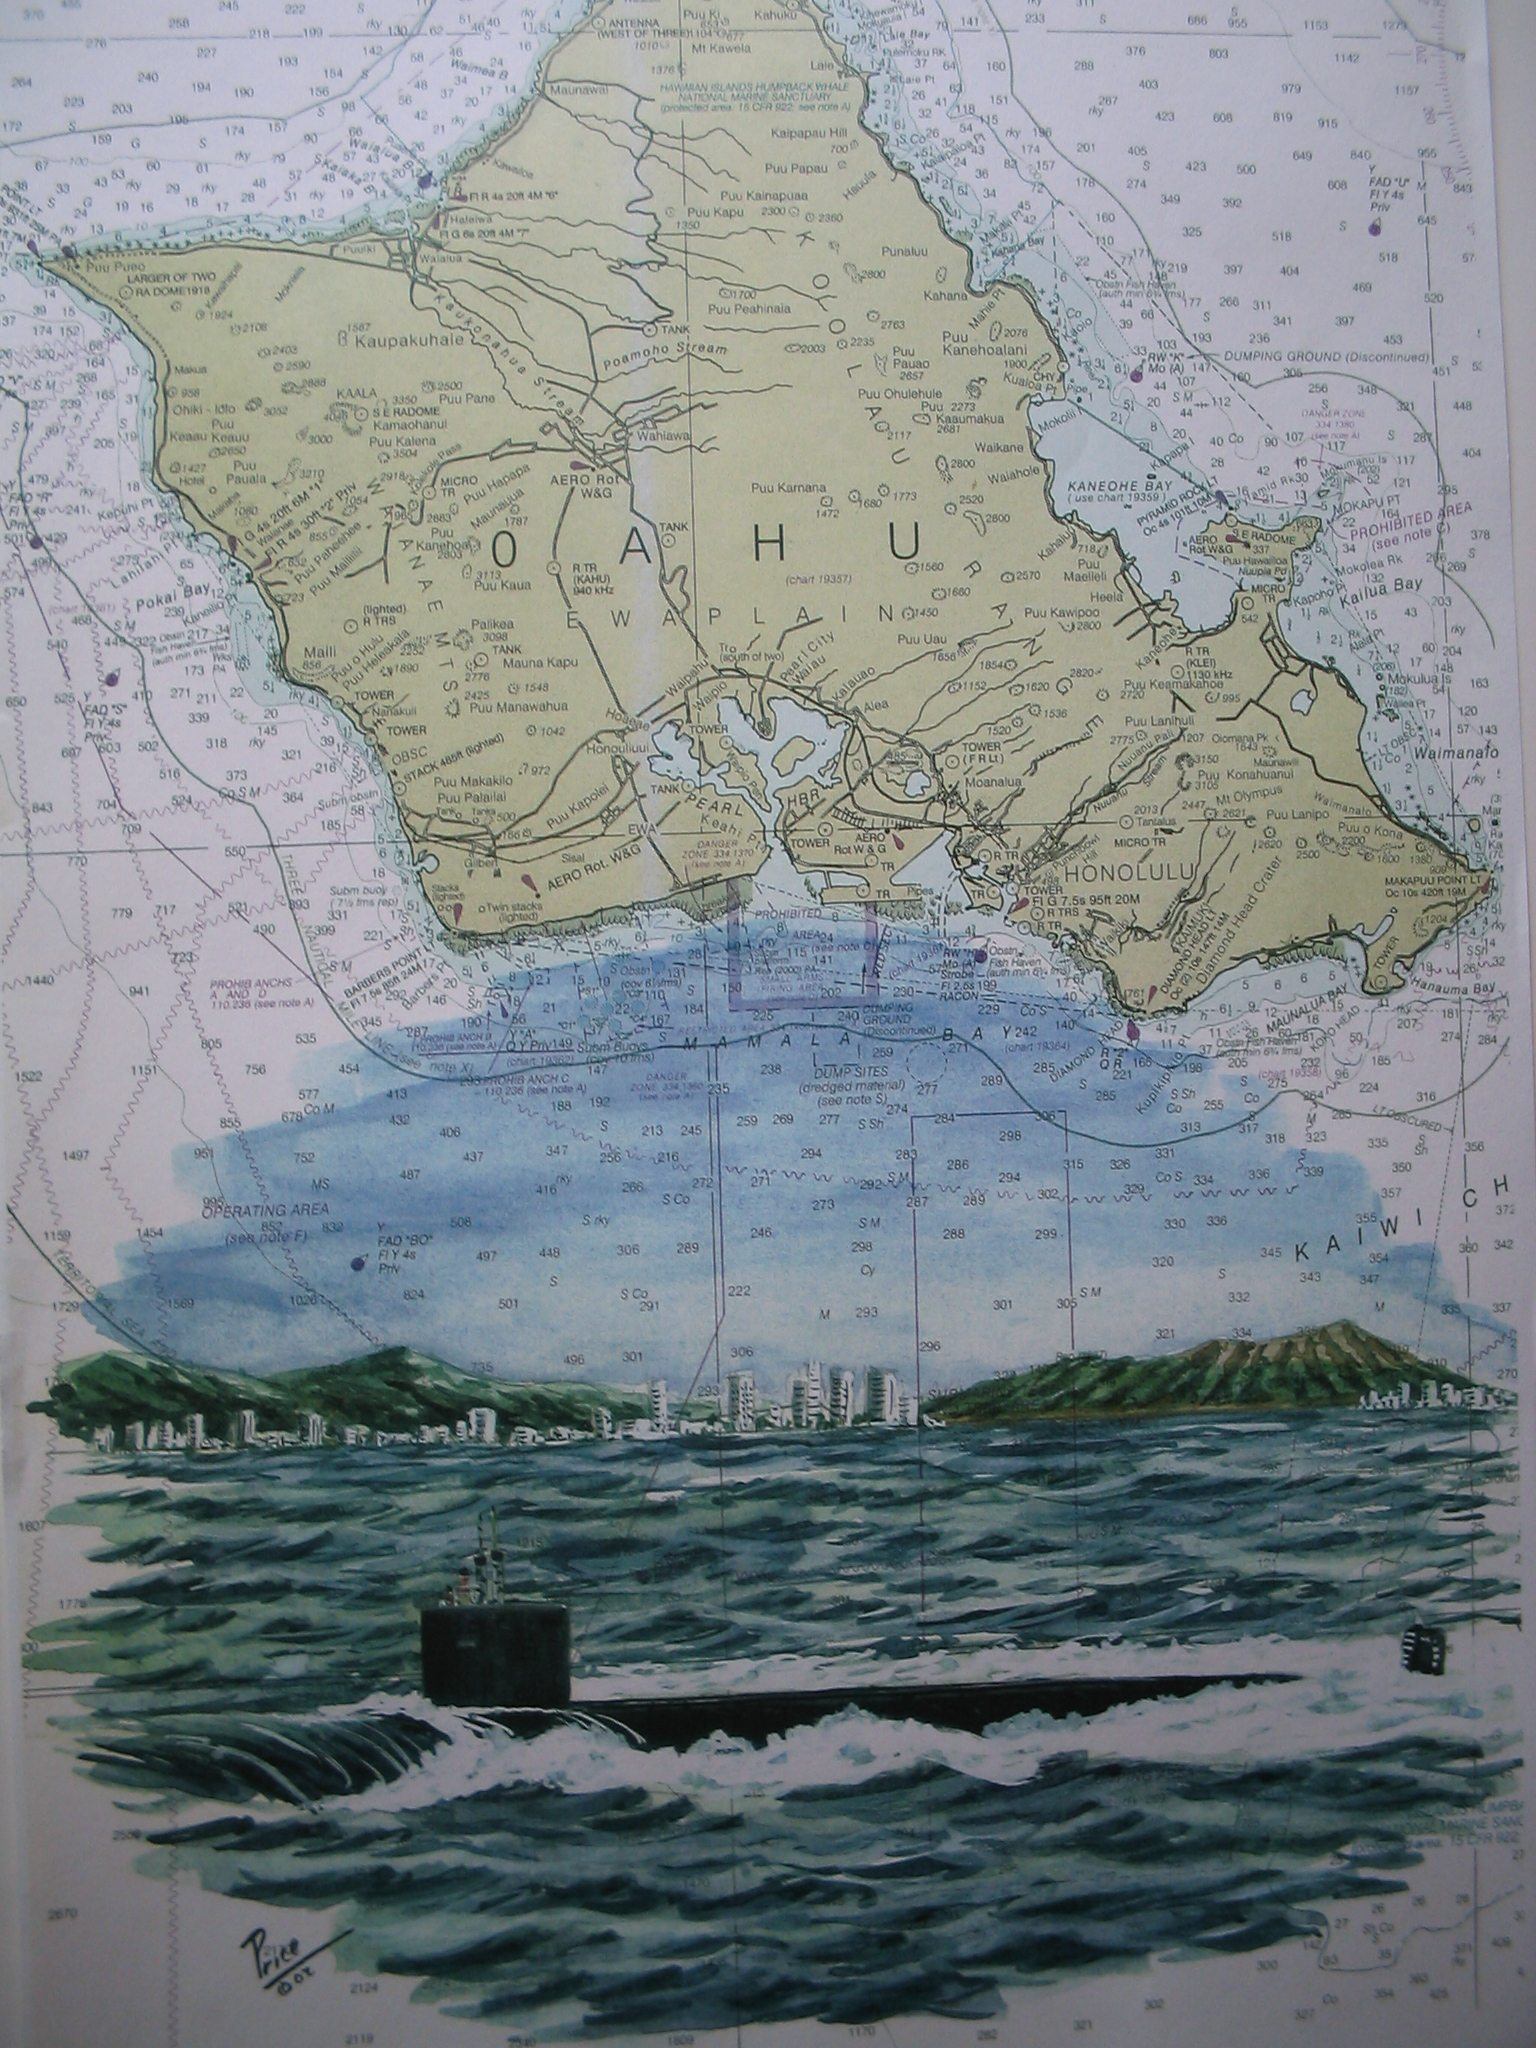 Submarine 688I Off Diamond Head Artwork - Painting by Daniel Price